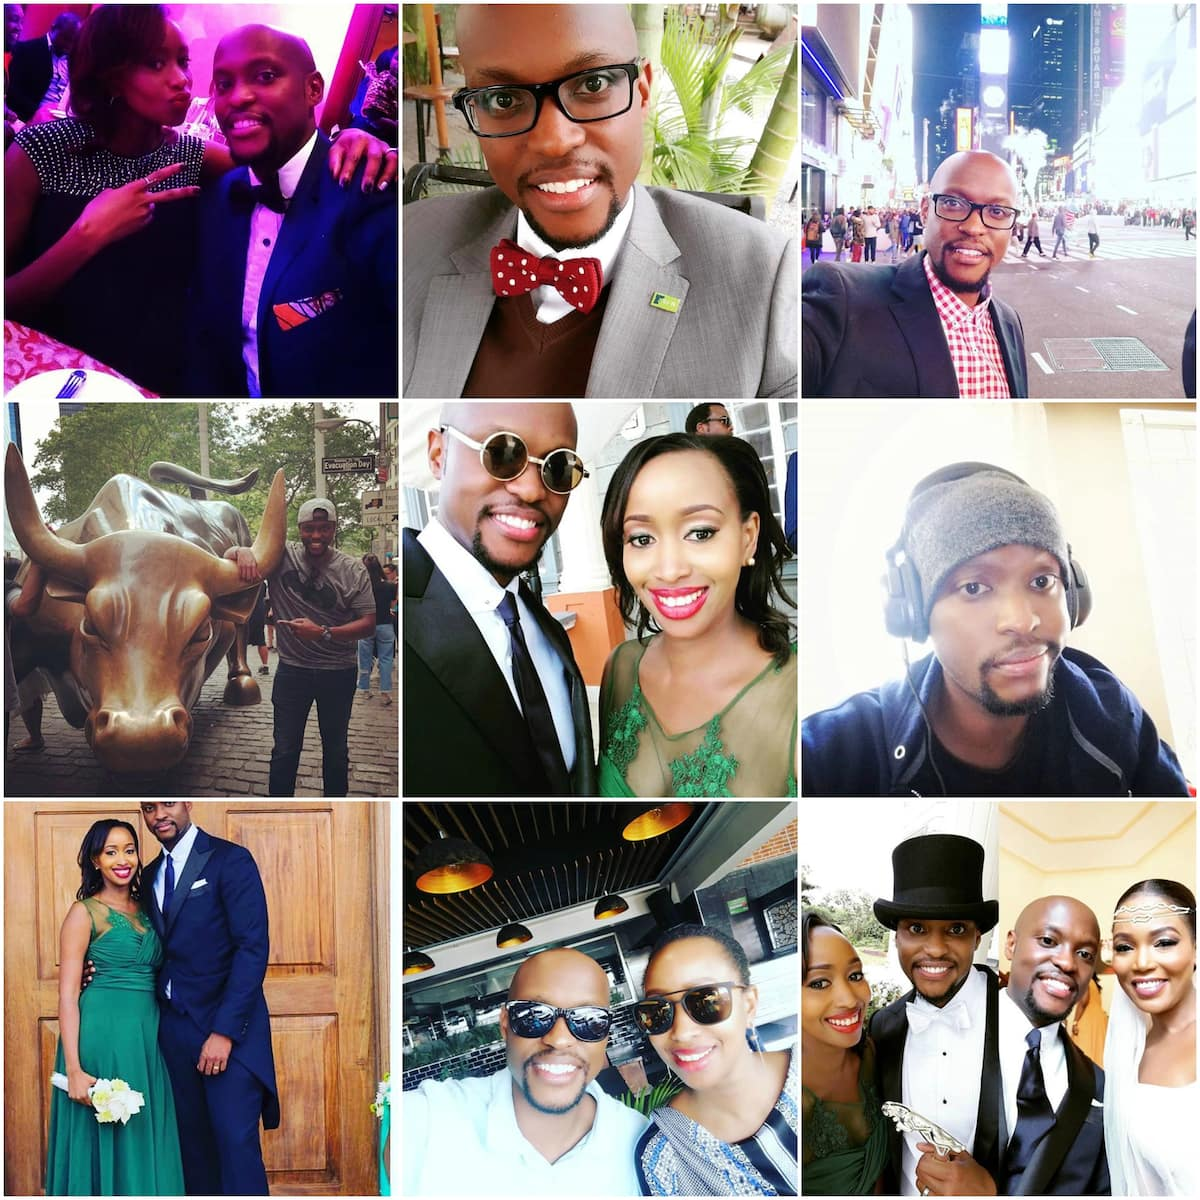 photos of Janet Mbugua and husband